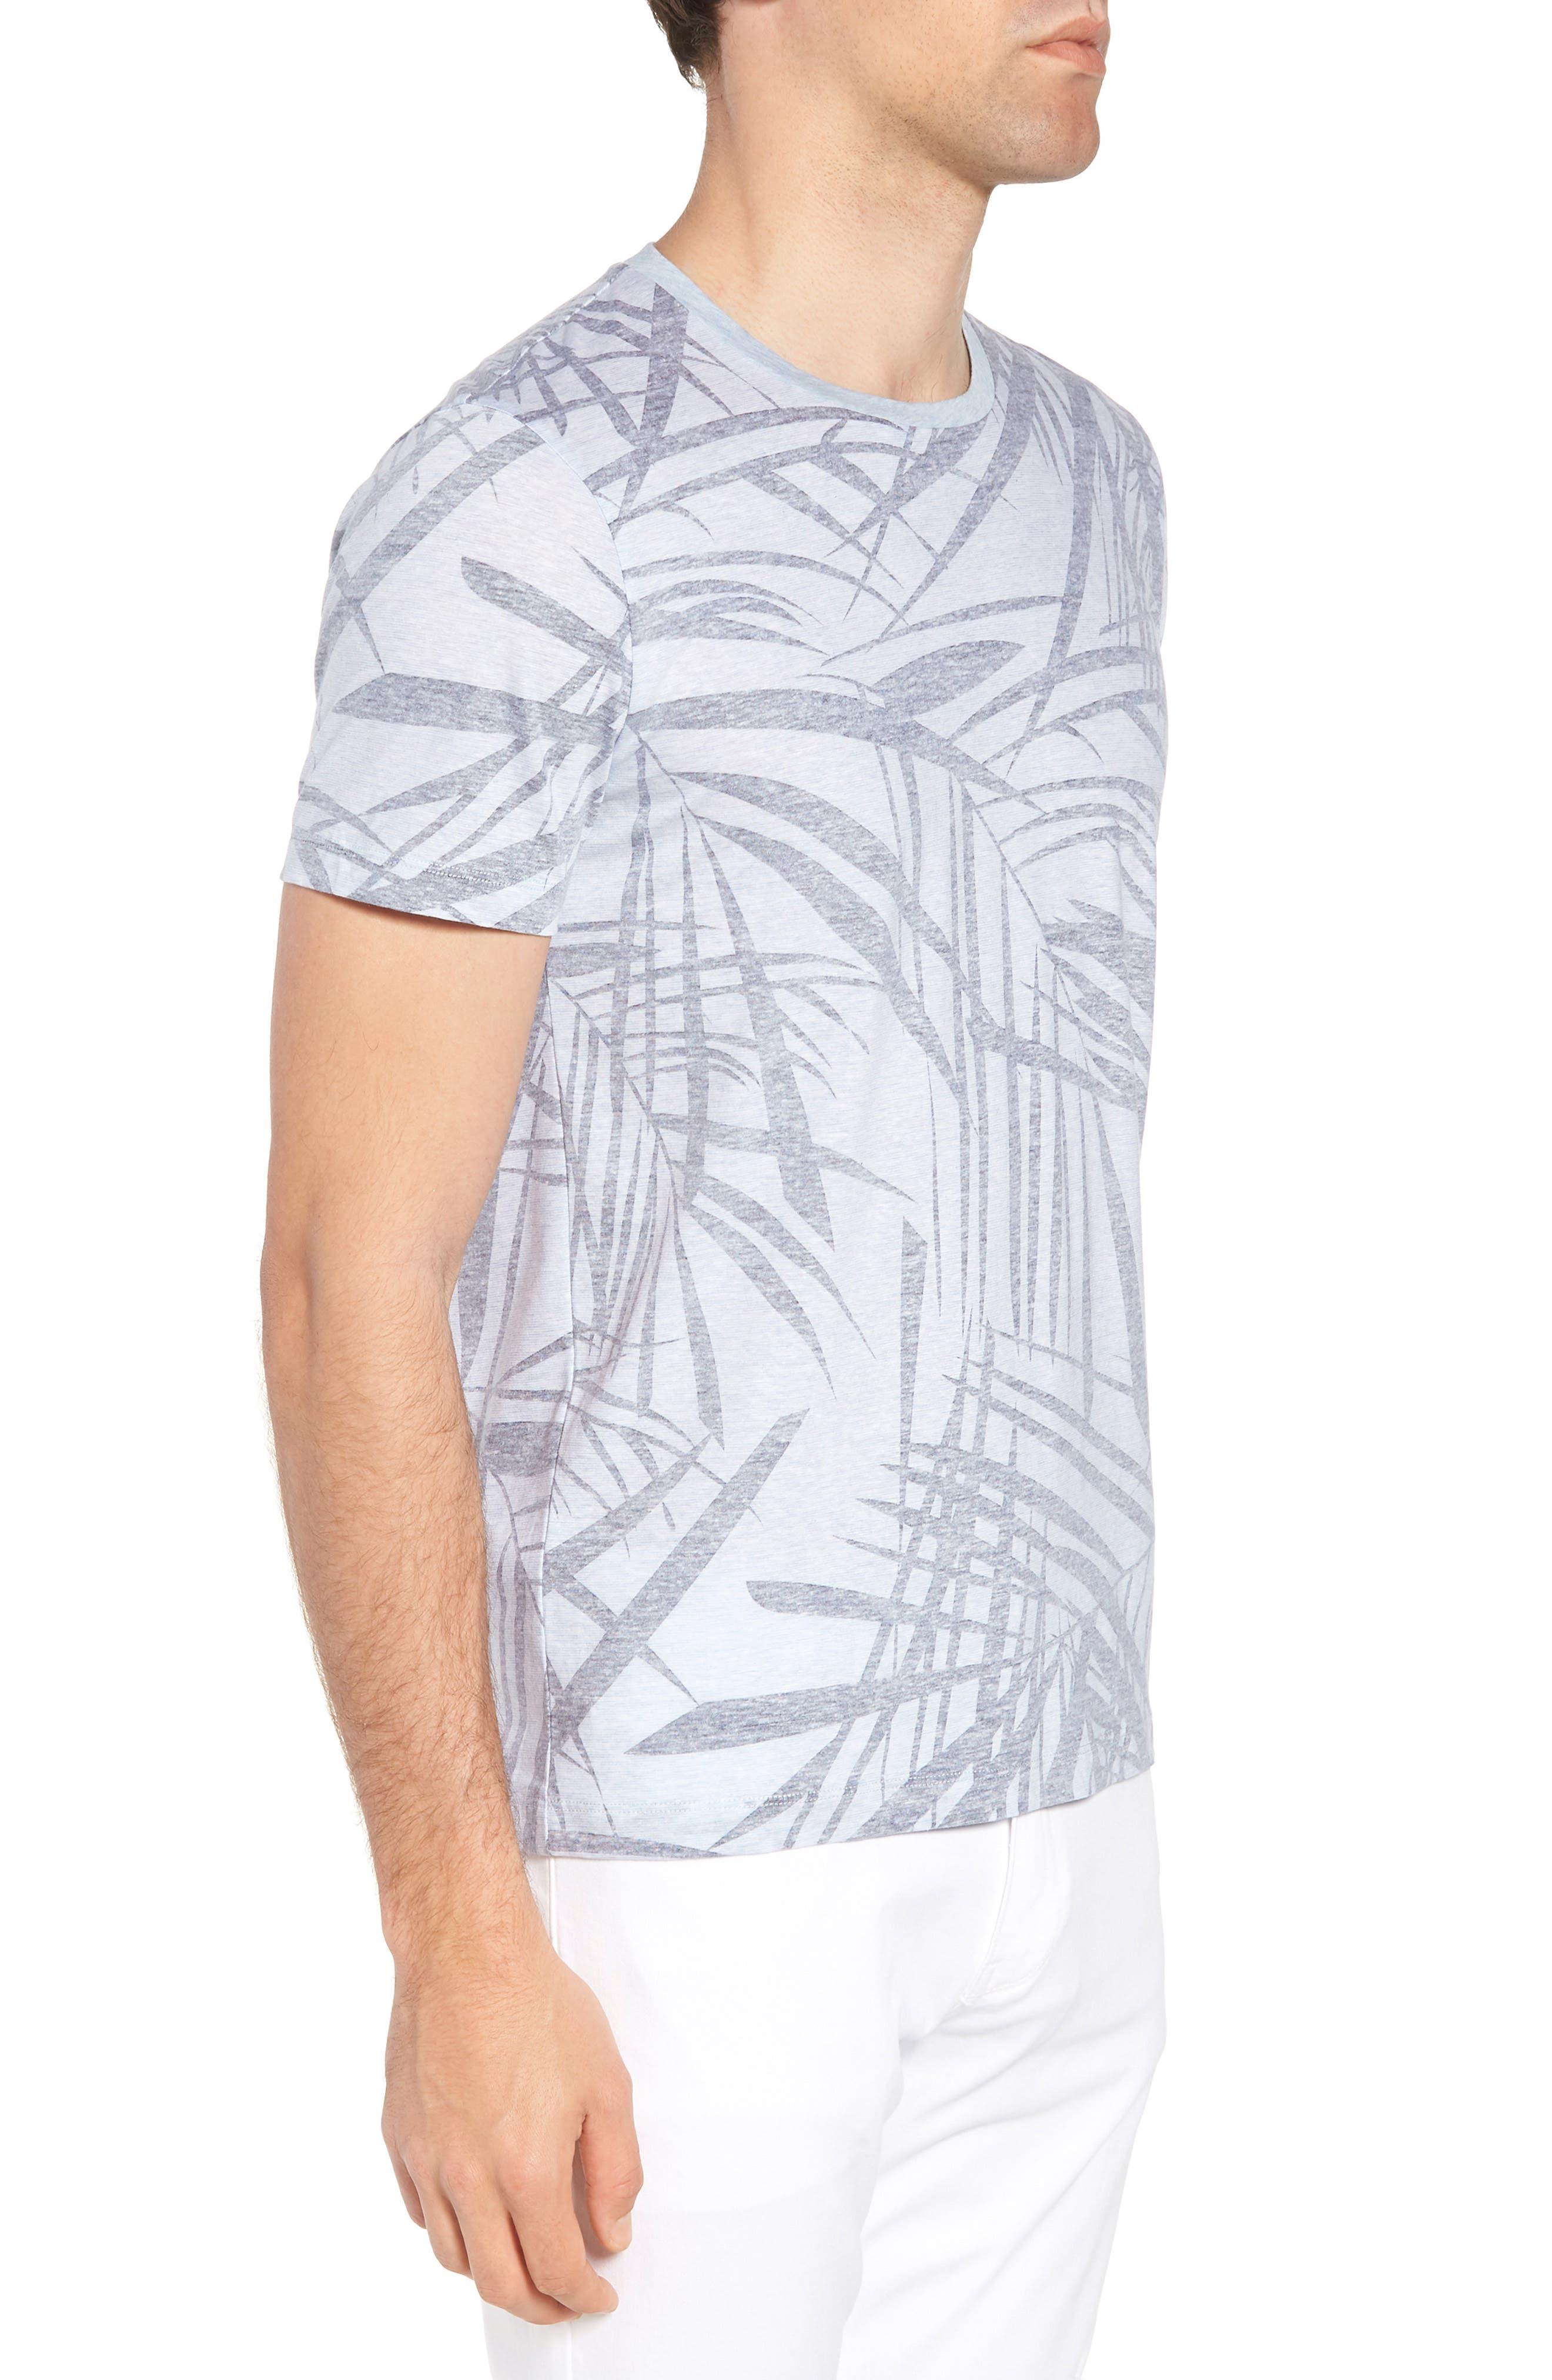 Tessler Crewneck T-Shirt,                             Alternate thumbnail 3, color,                             BLUE